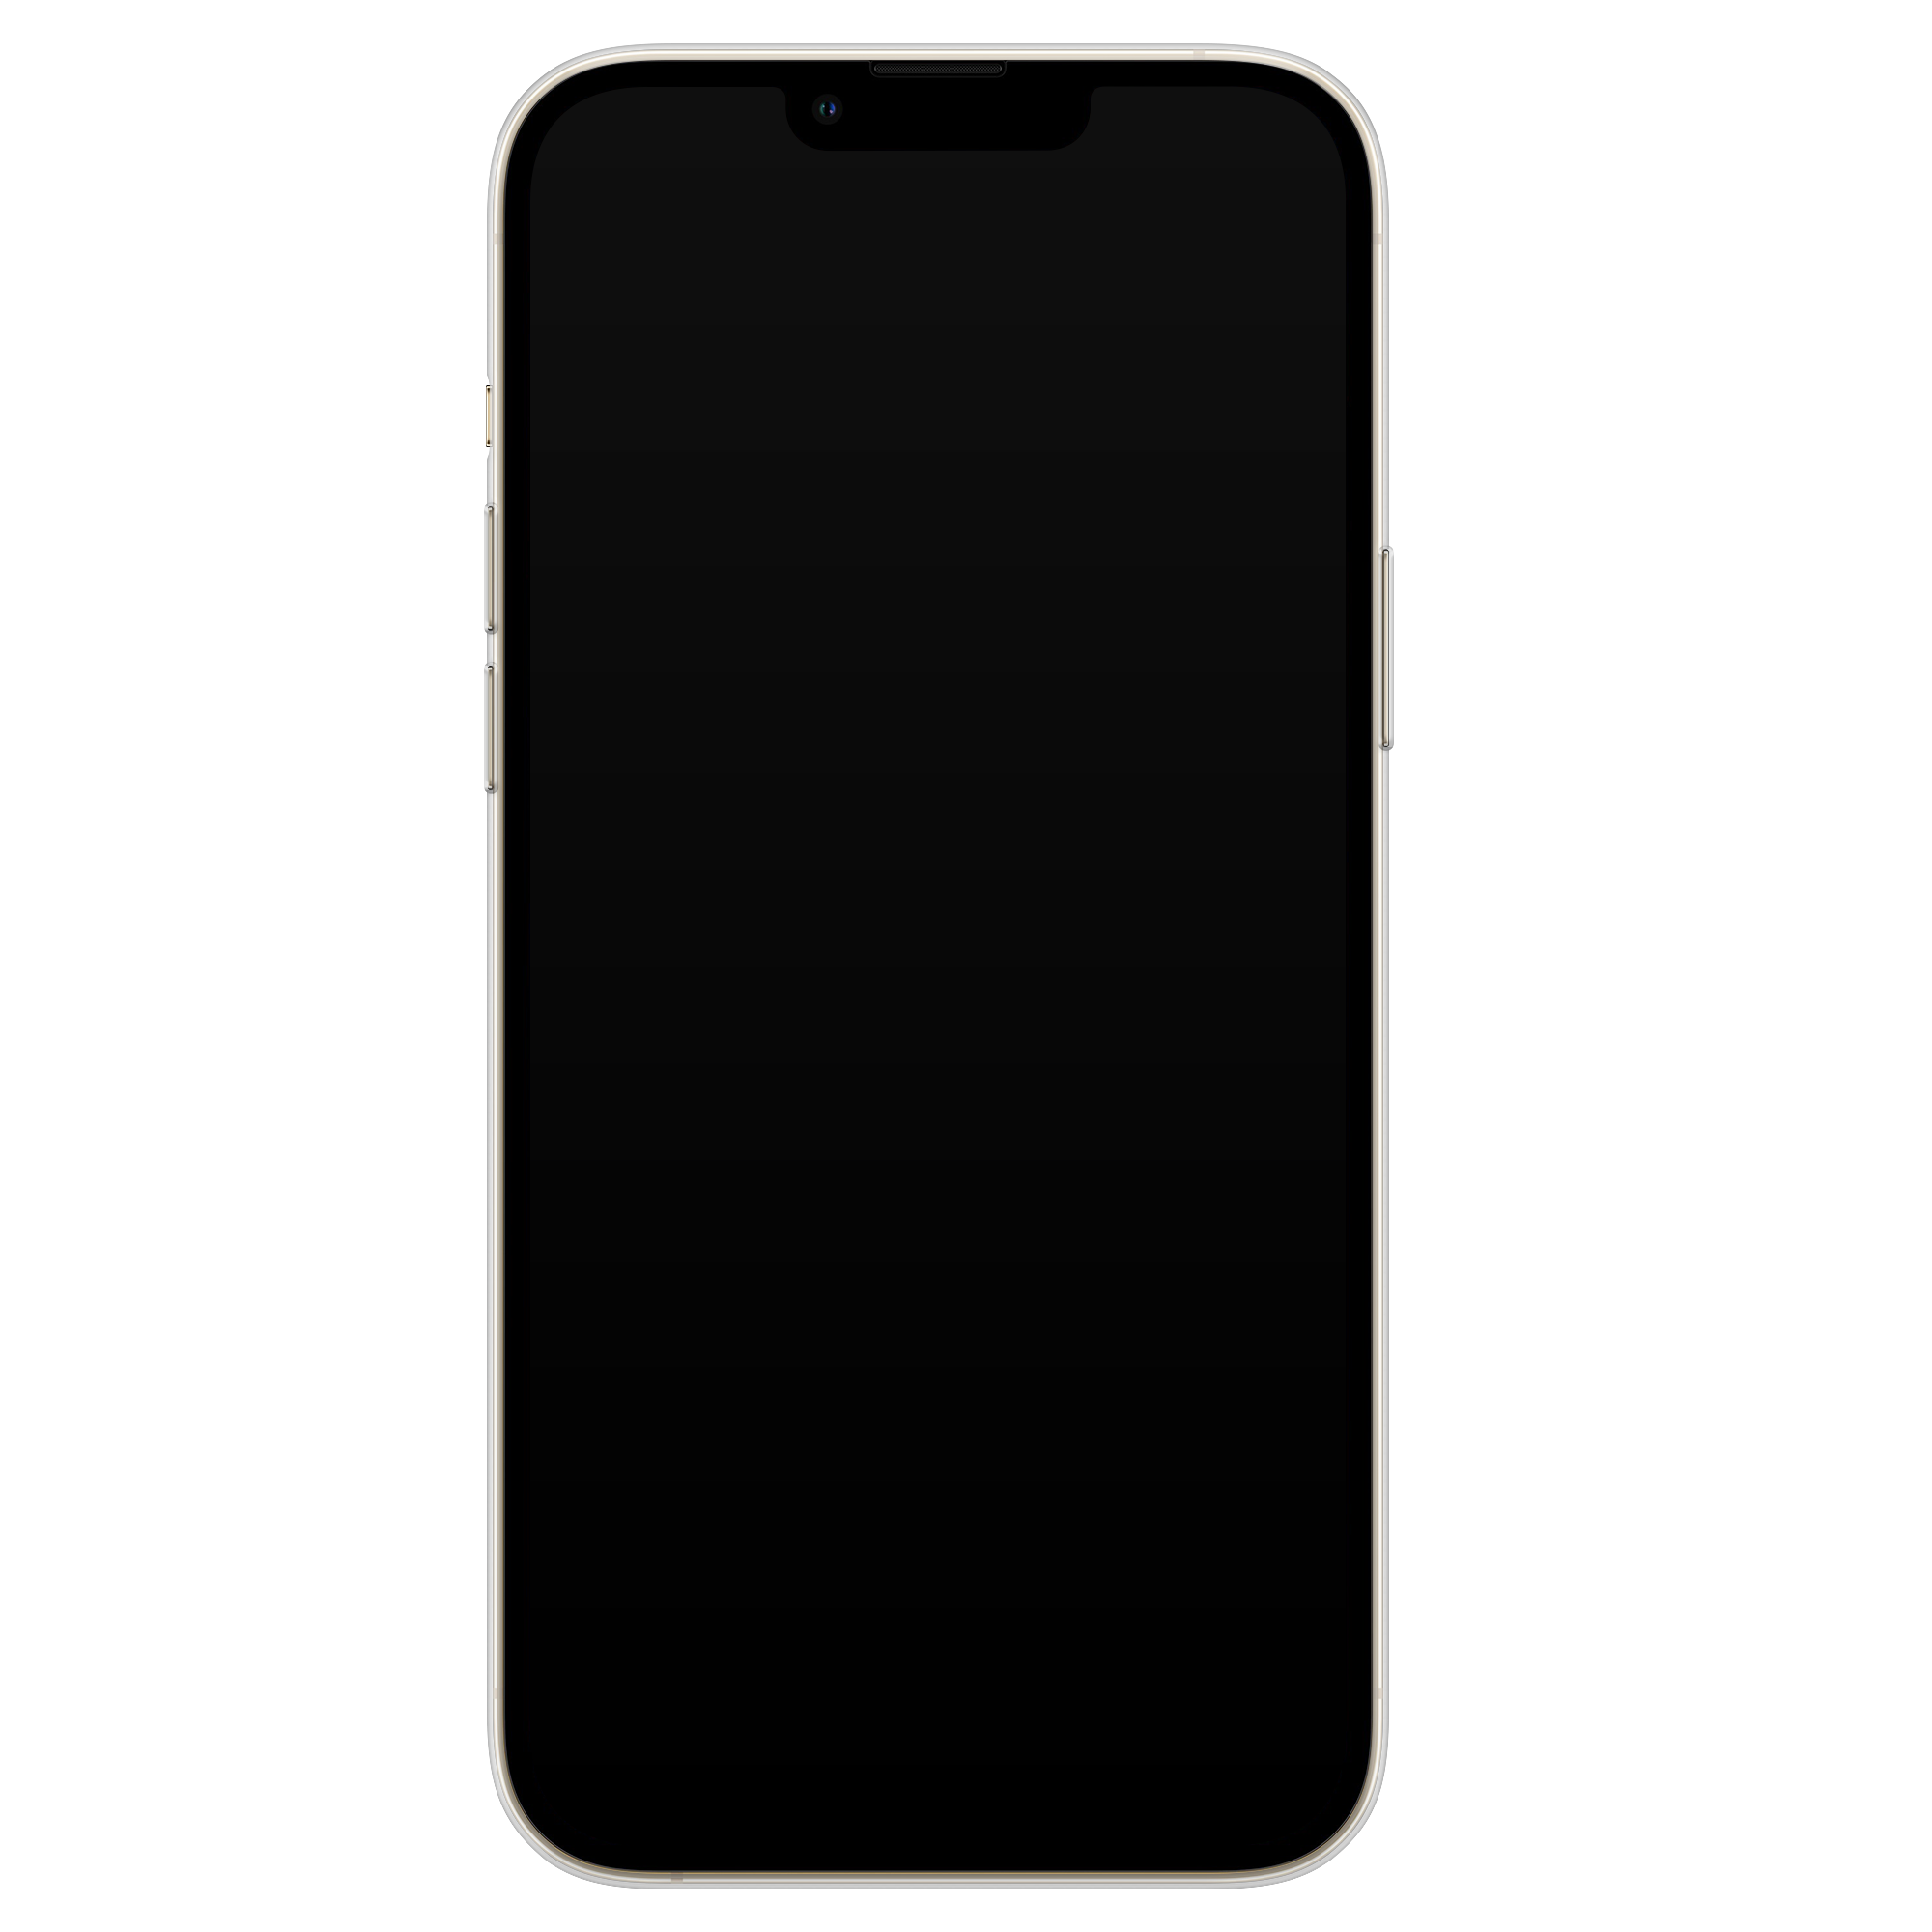 Leuke Telefoonhoesjes iPhone 13 Pro Max siliconen hoesje - Do the things you love